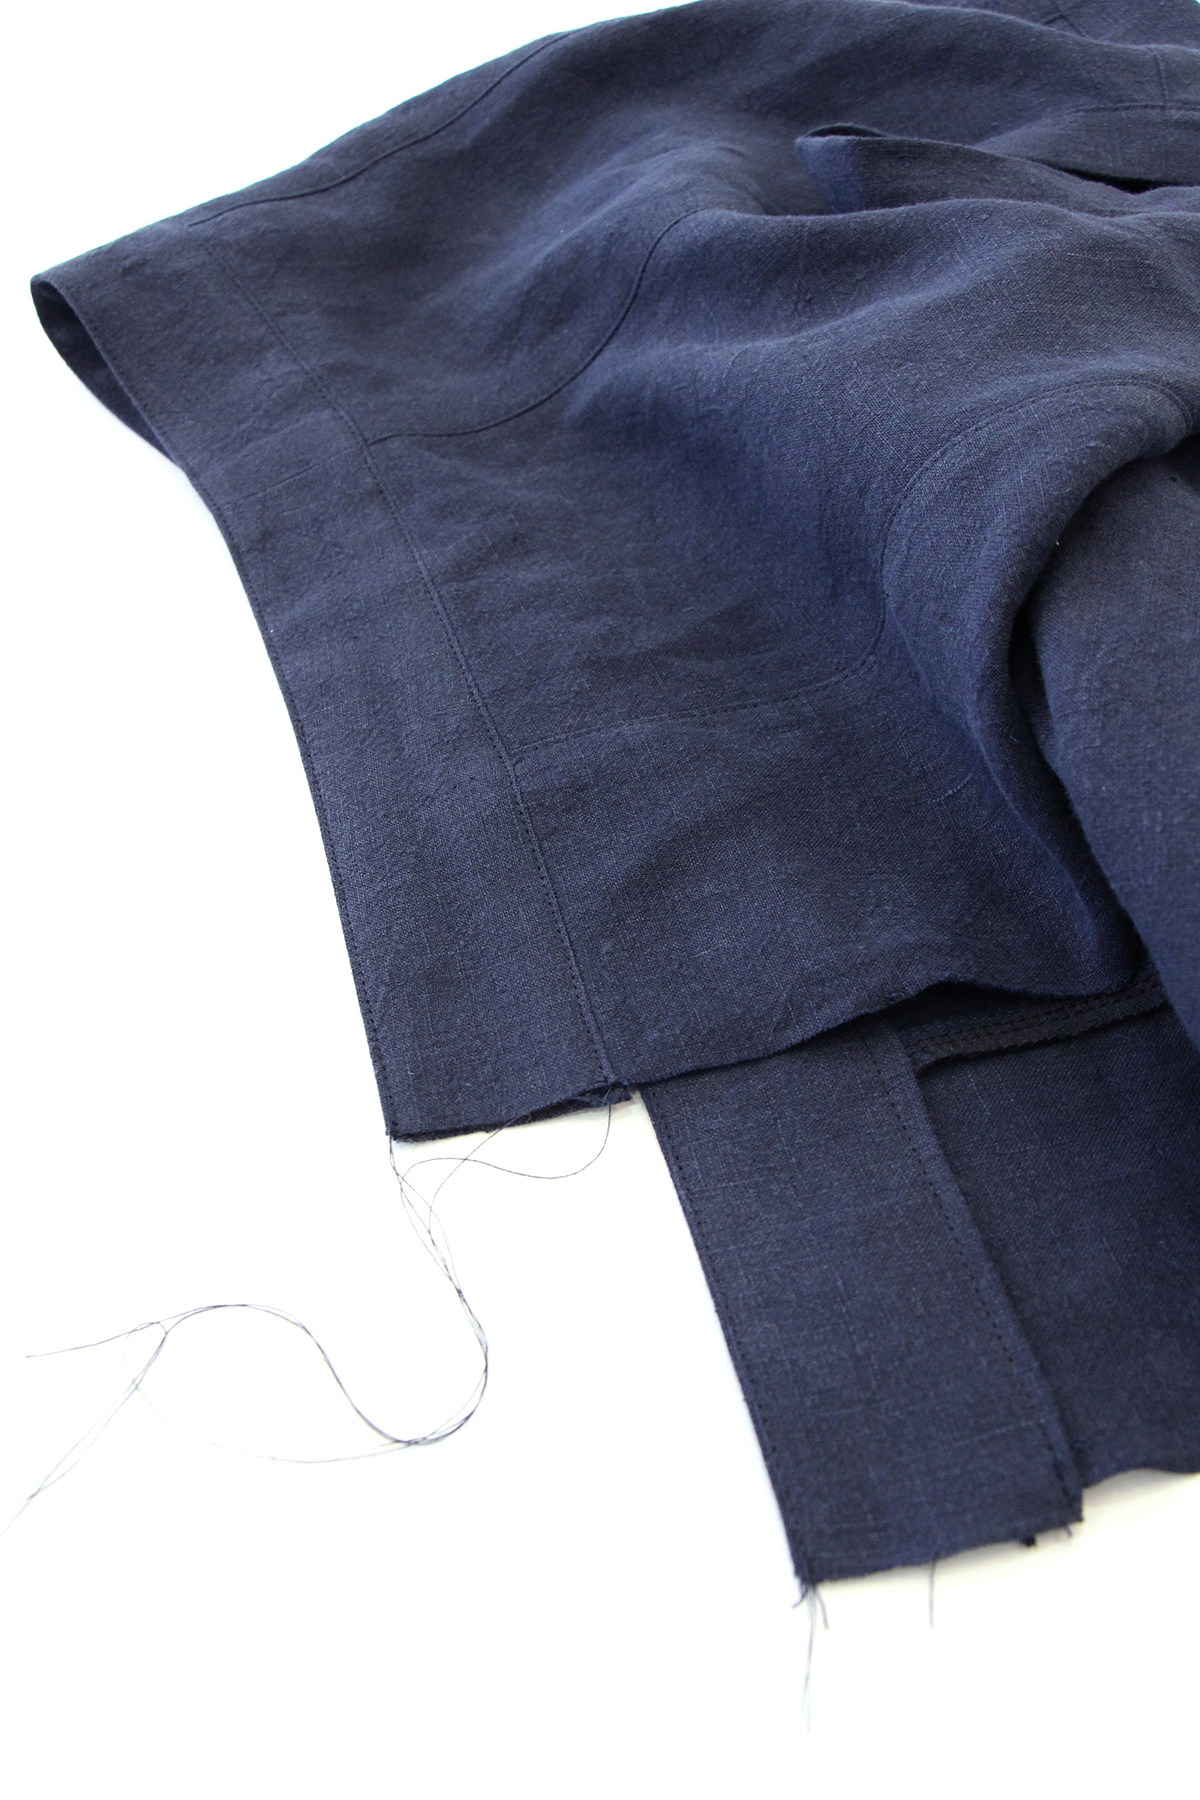 Megan Nielsen Patterns   Matilda Sewalong: Matching Set Hack   Top Stitching Your Top Waistband